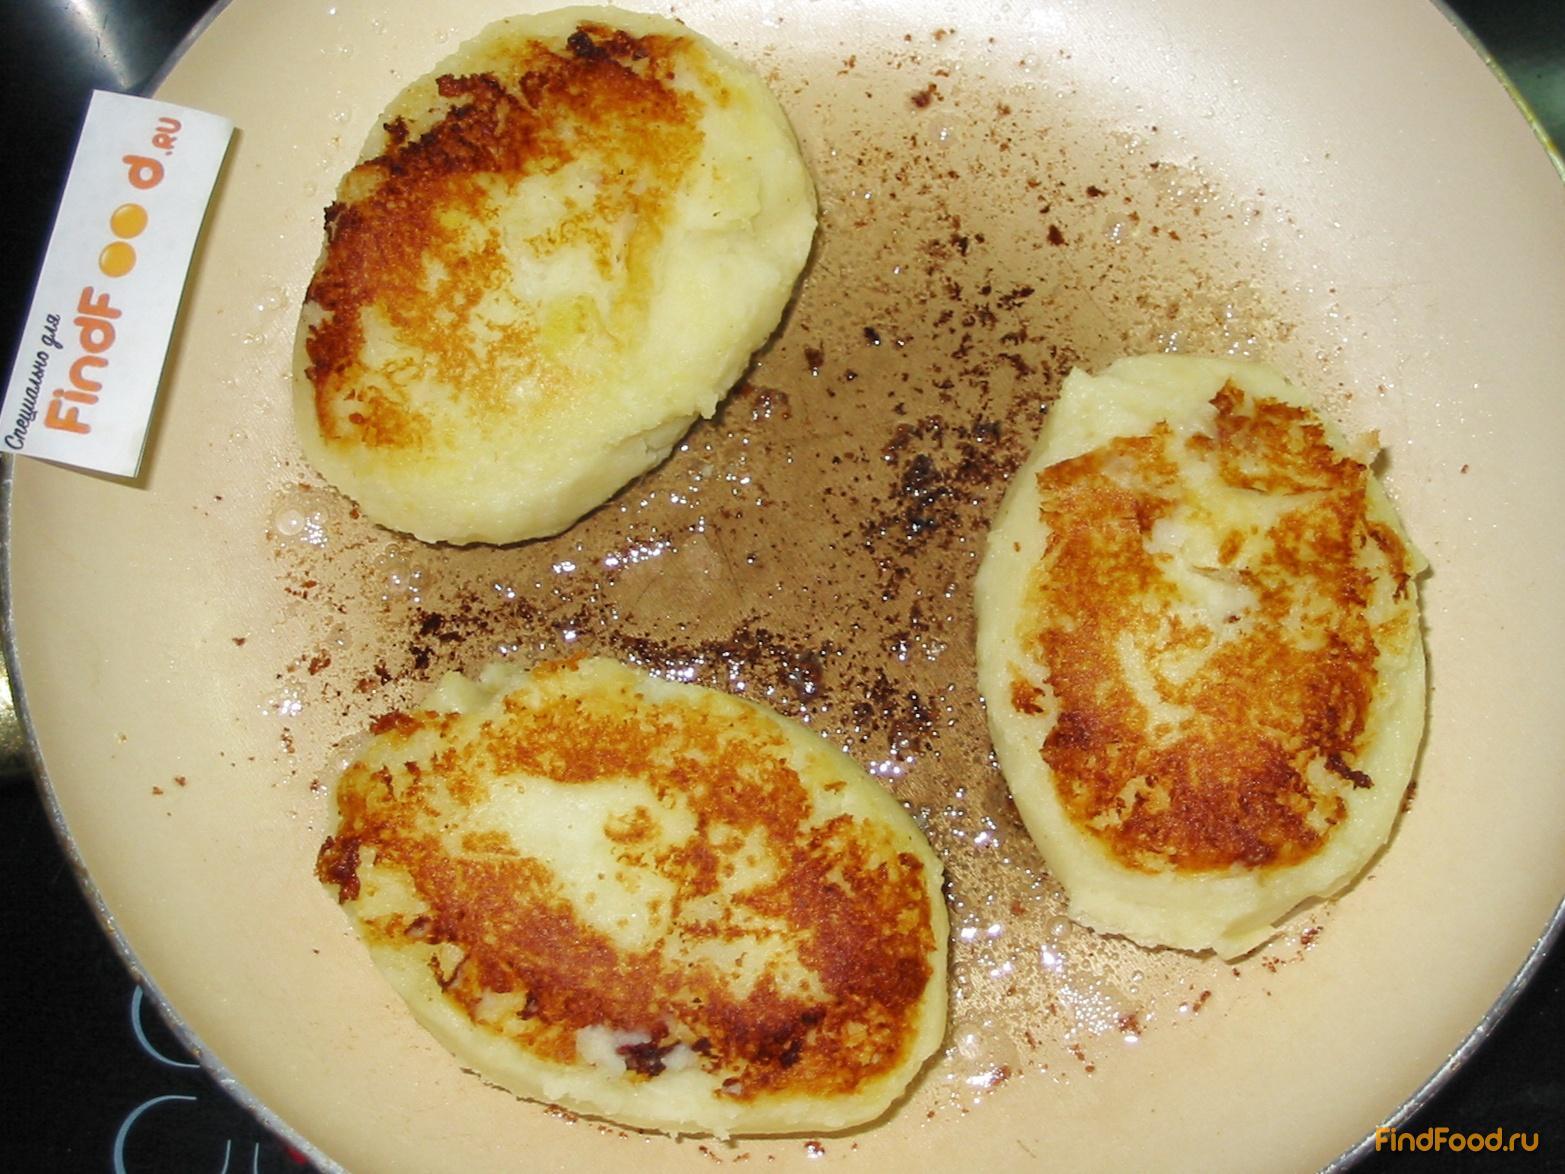 Пирожки из картошки с мясом на сковороде рецепт пошагово